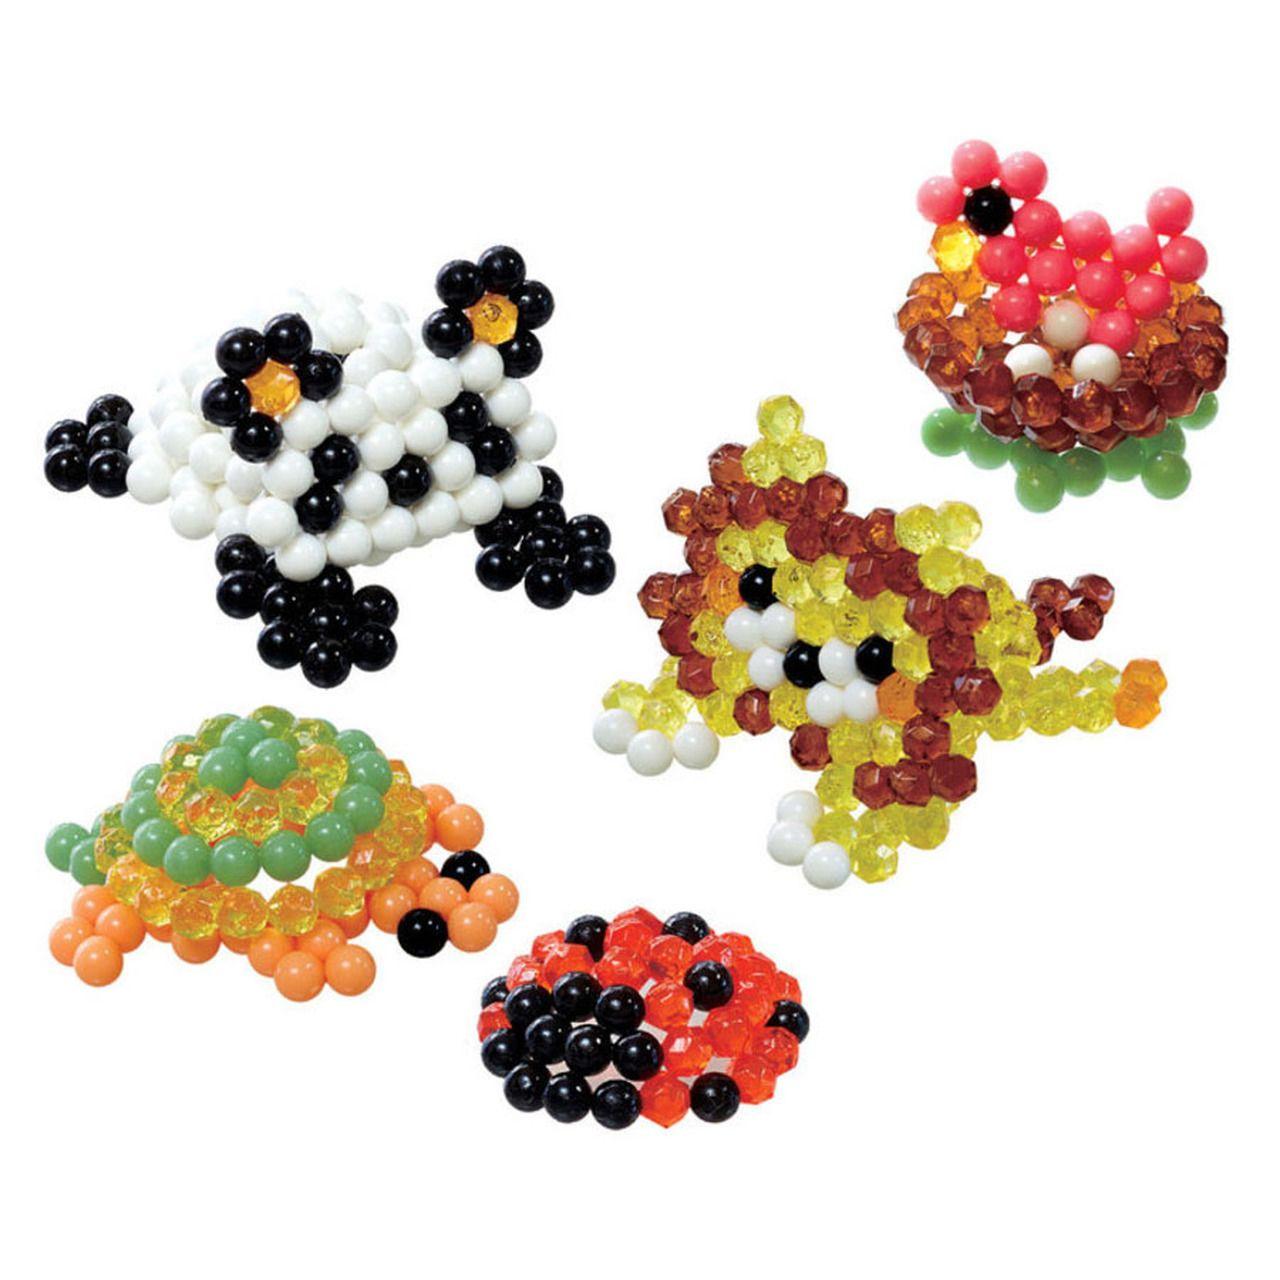 Hot Selling Aqua Beads Set 3d Puzzle Toys